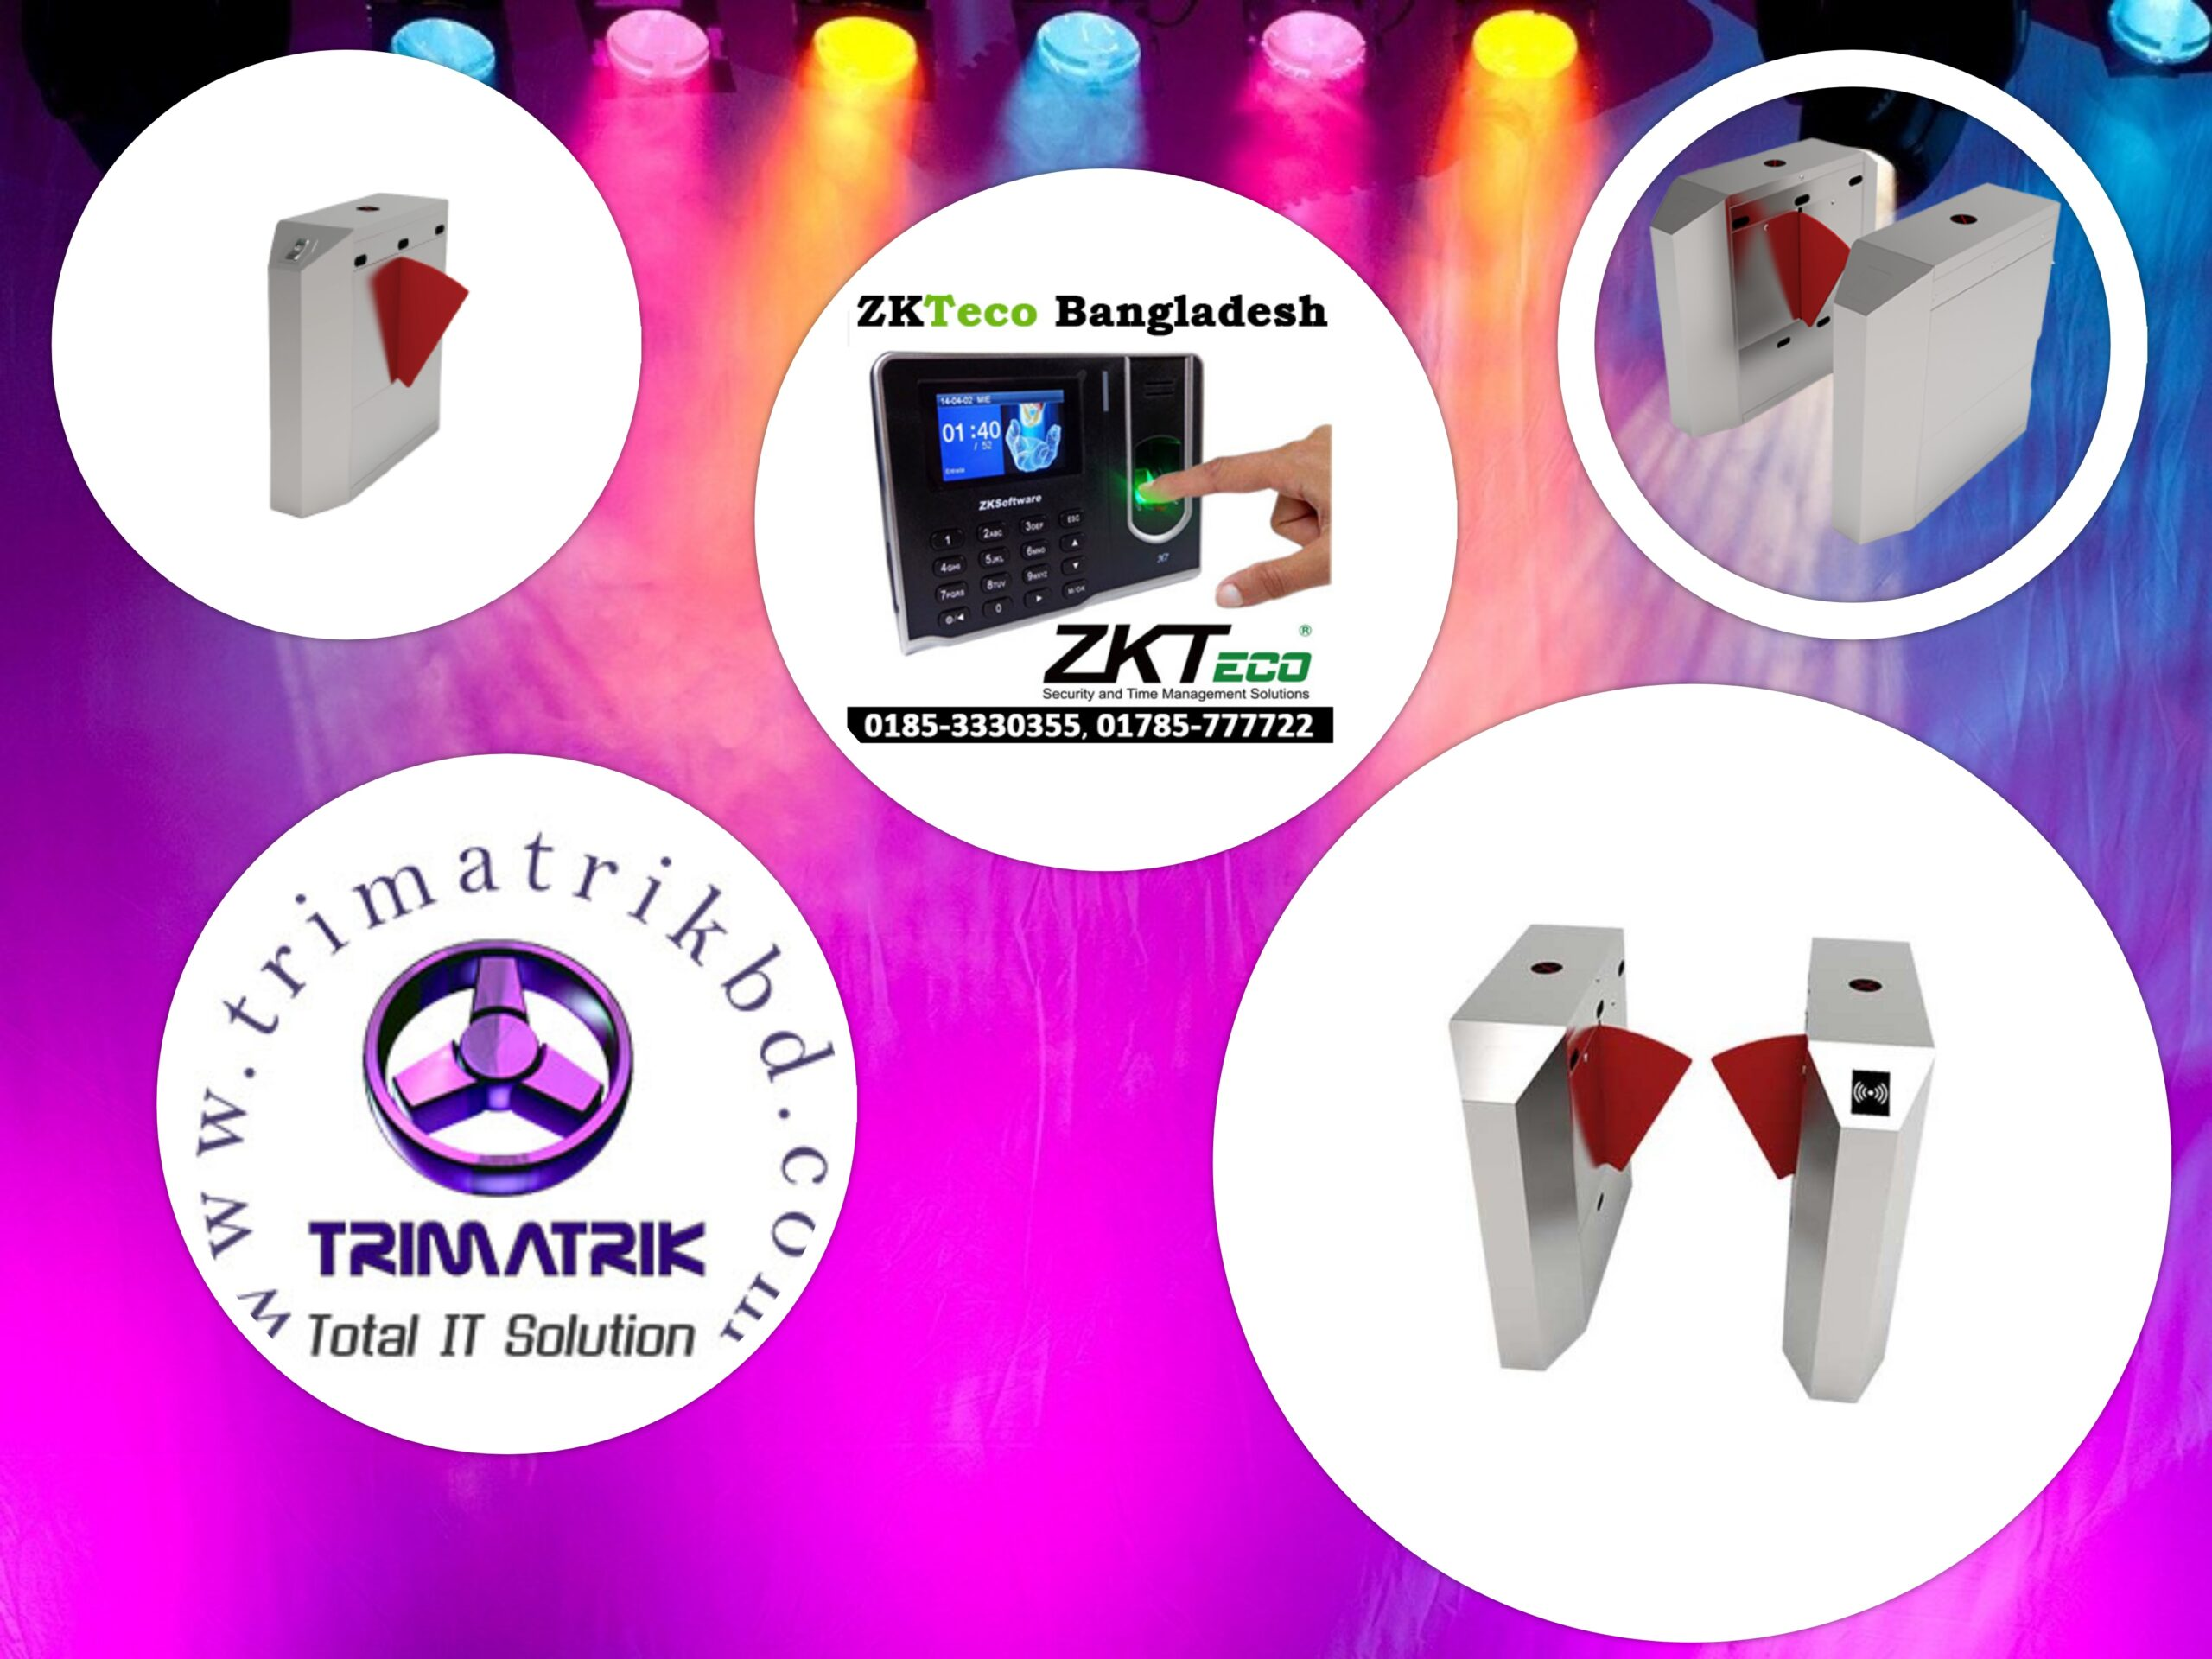 ZKTeco FBL2022 Pro Bangladesh, ZKTeco FBL2022 Pro Price in Bangladesh, ZKTeco FBL2022 Pro BD